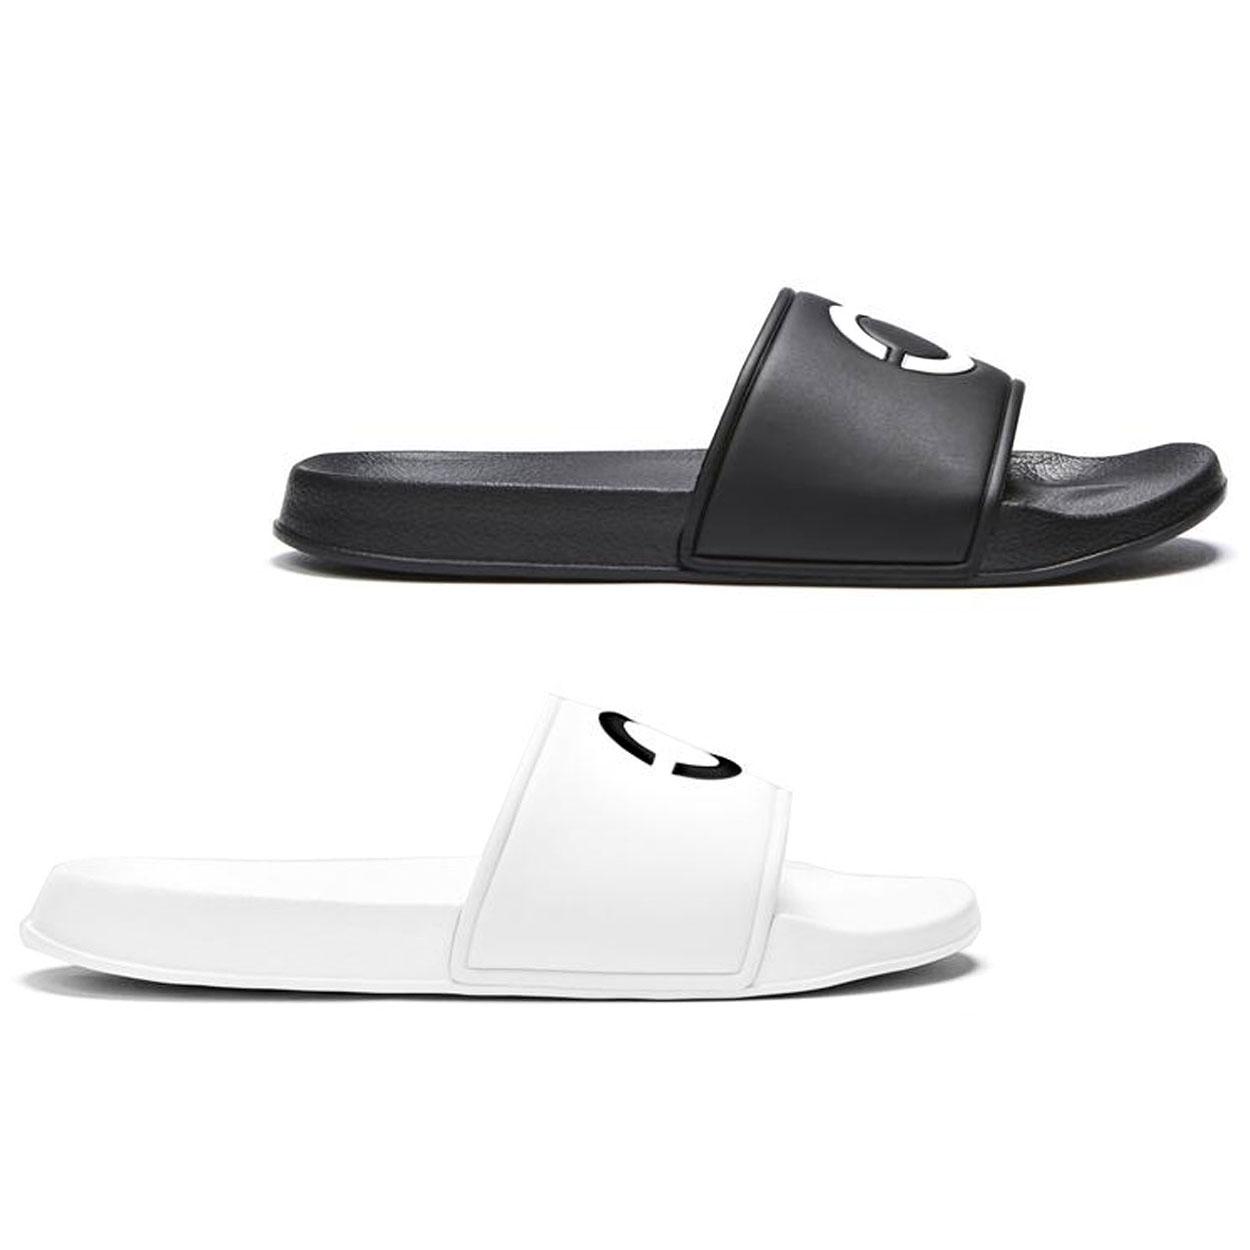 7b5b9ef48 Details about Certified London Palmero Mens Fashion Beach Holiday Flip Flop  Slide